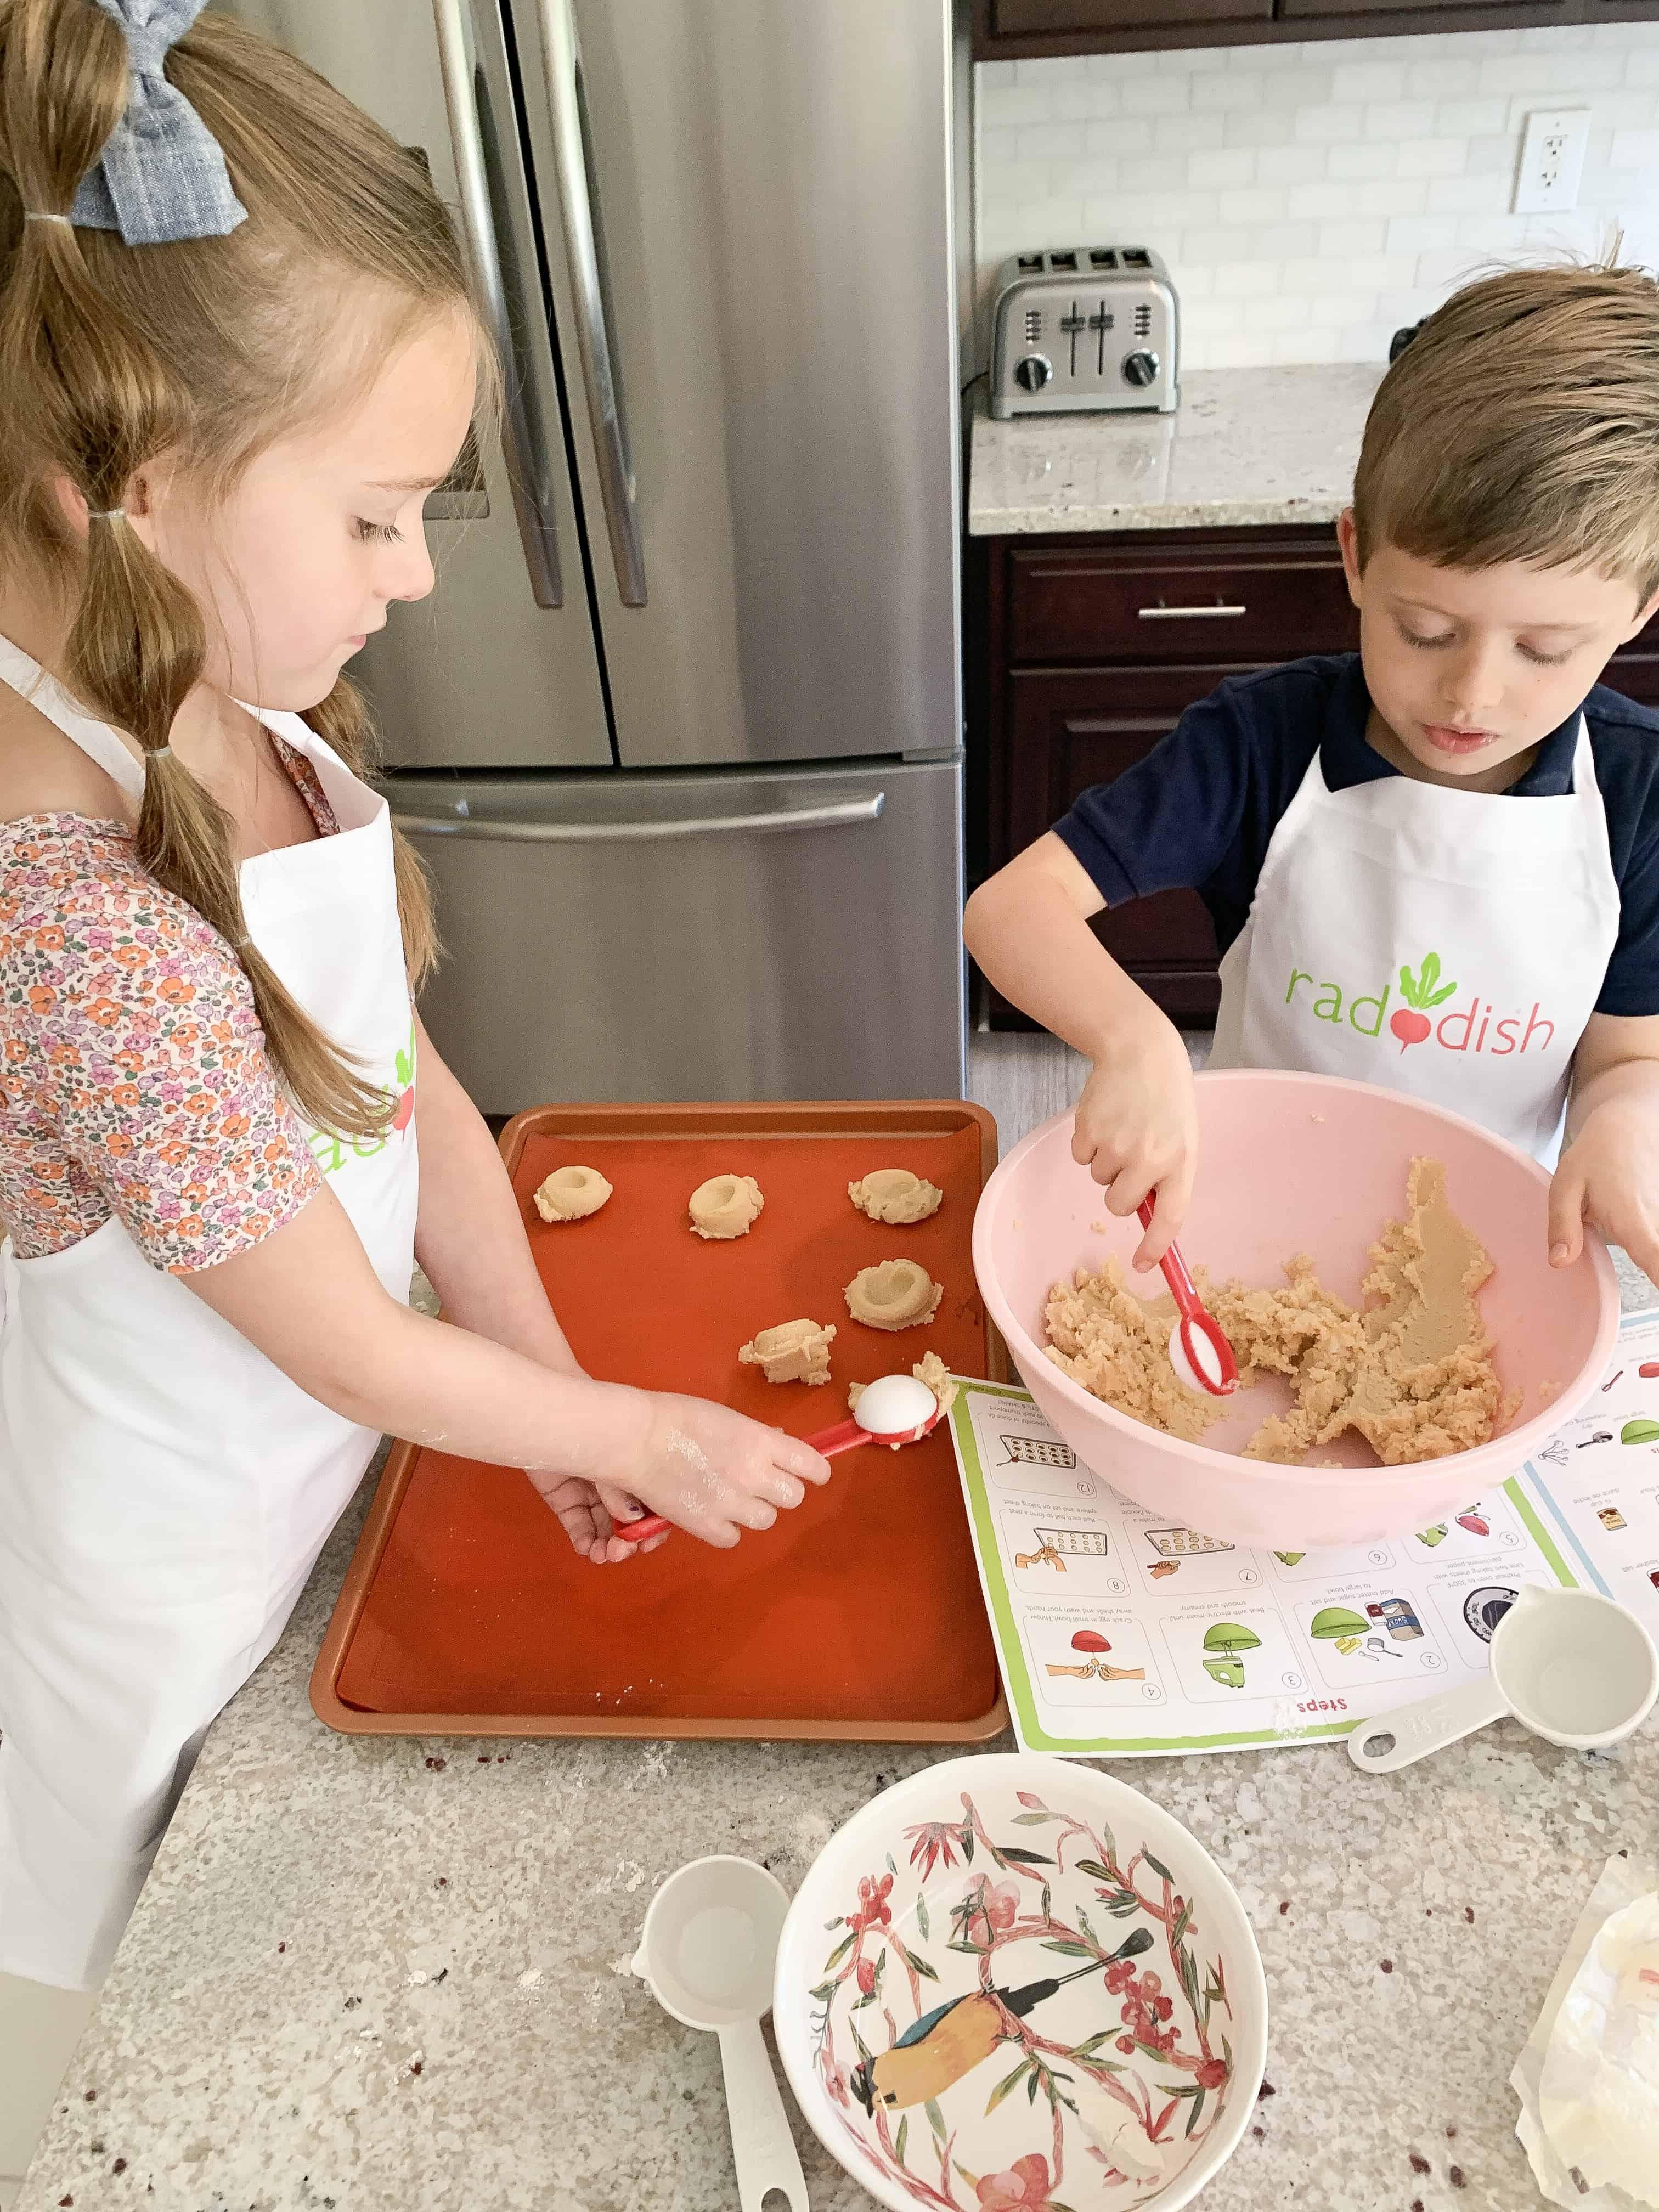 Kids cooking in kitchen